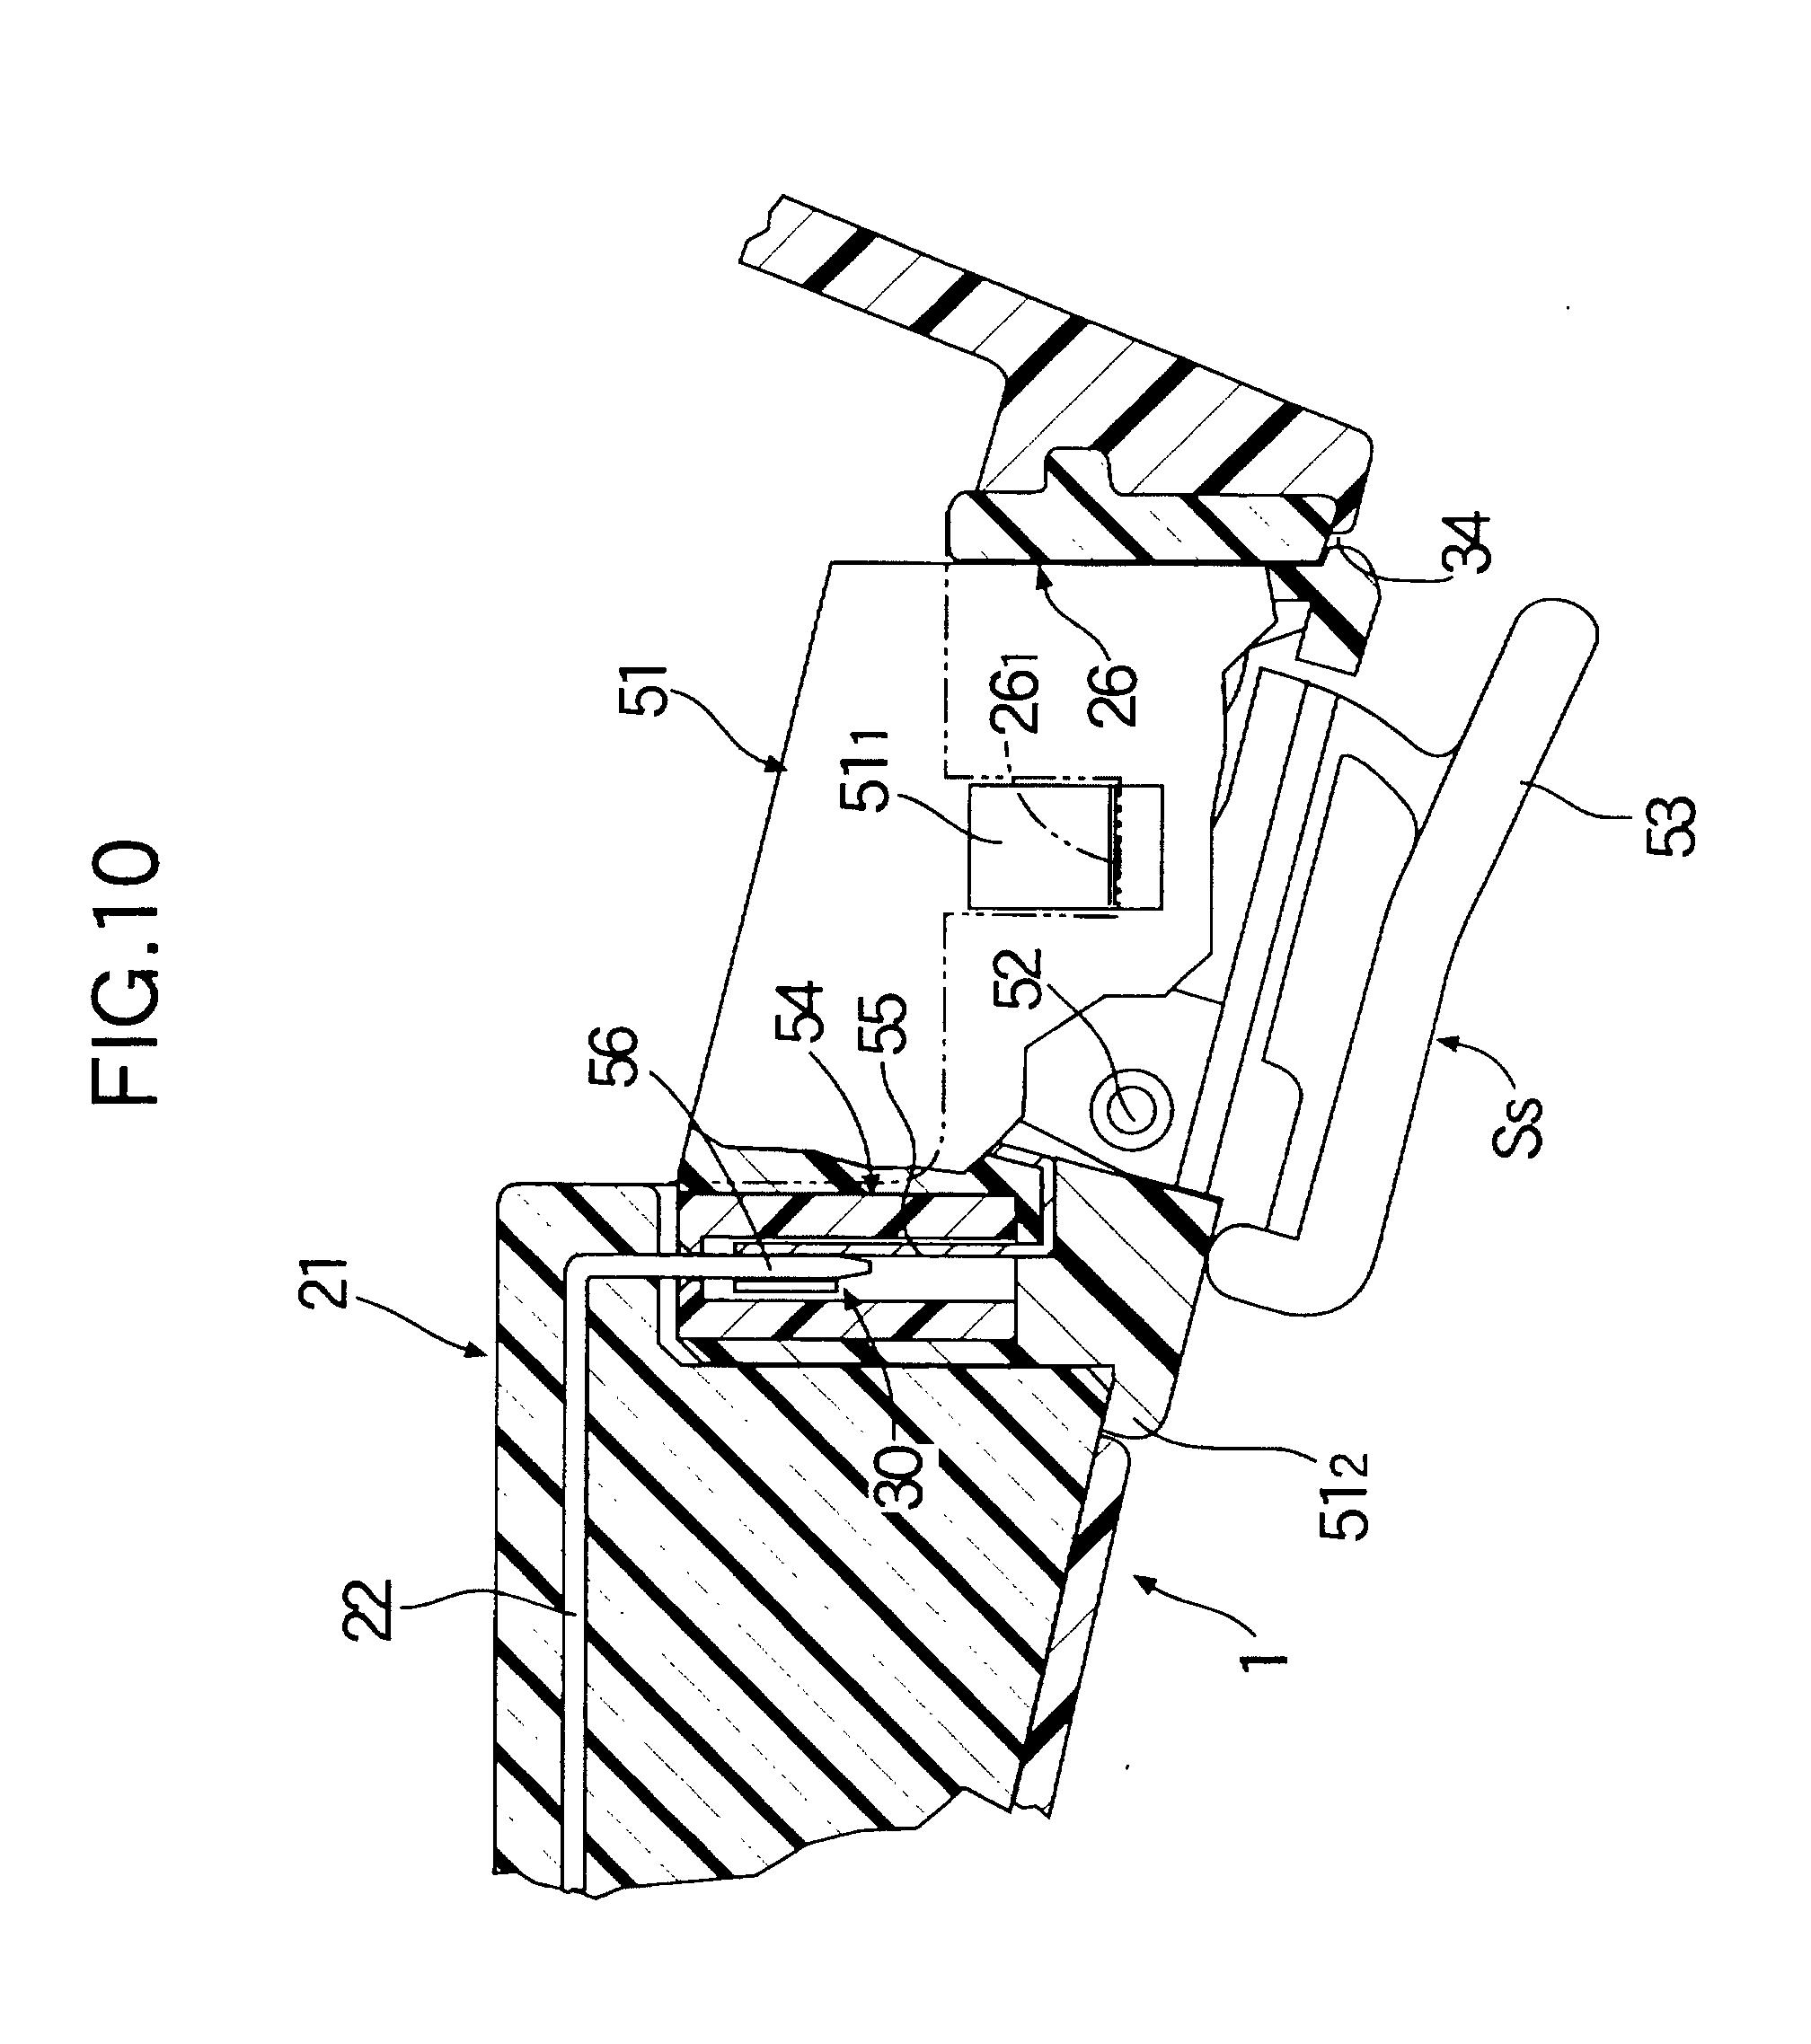 simplified motorcycle wiring diagram simplified get free image about wiring diagram